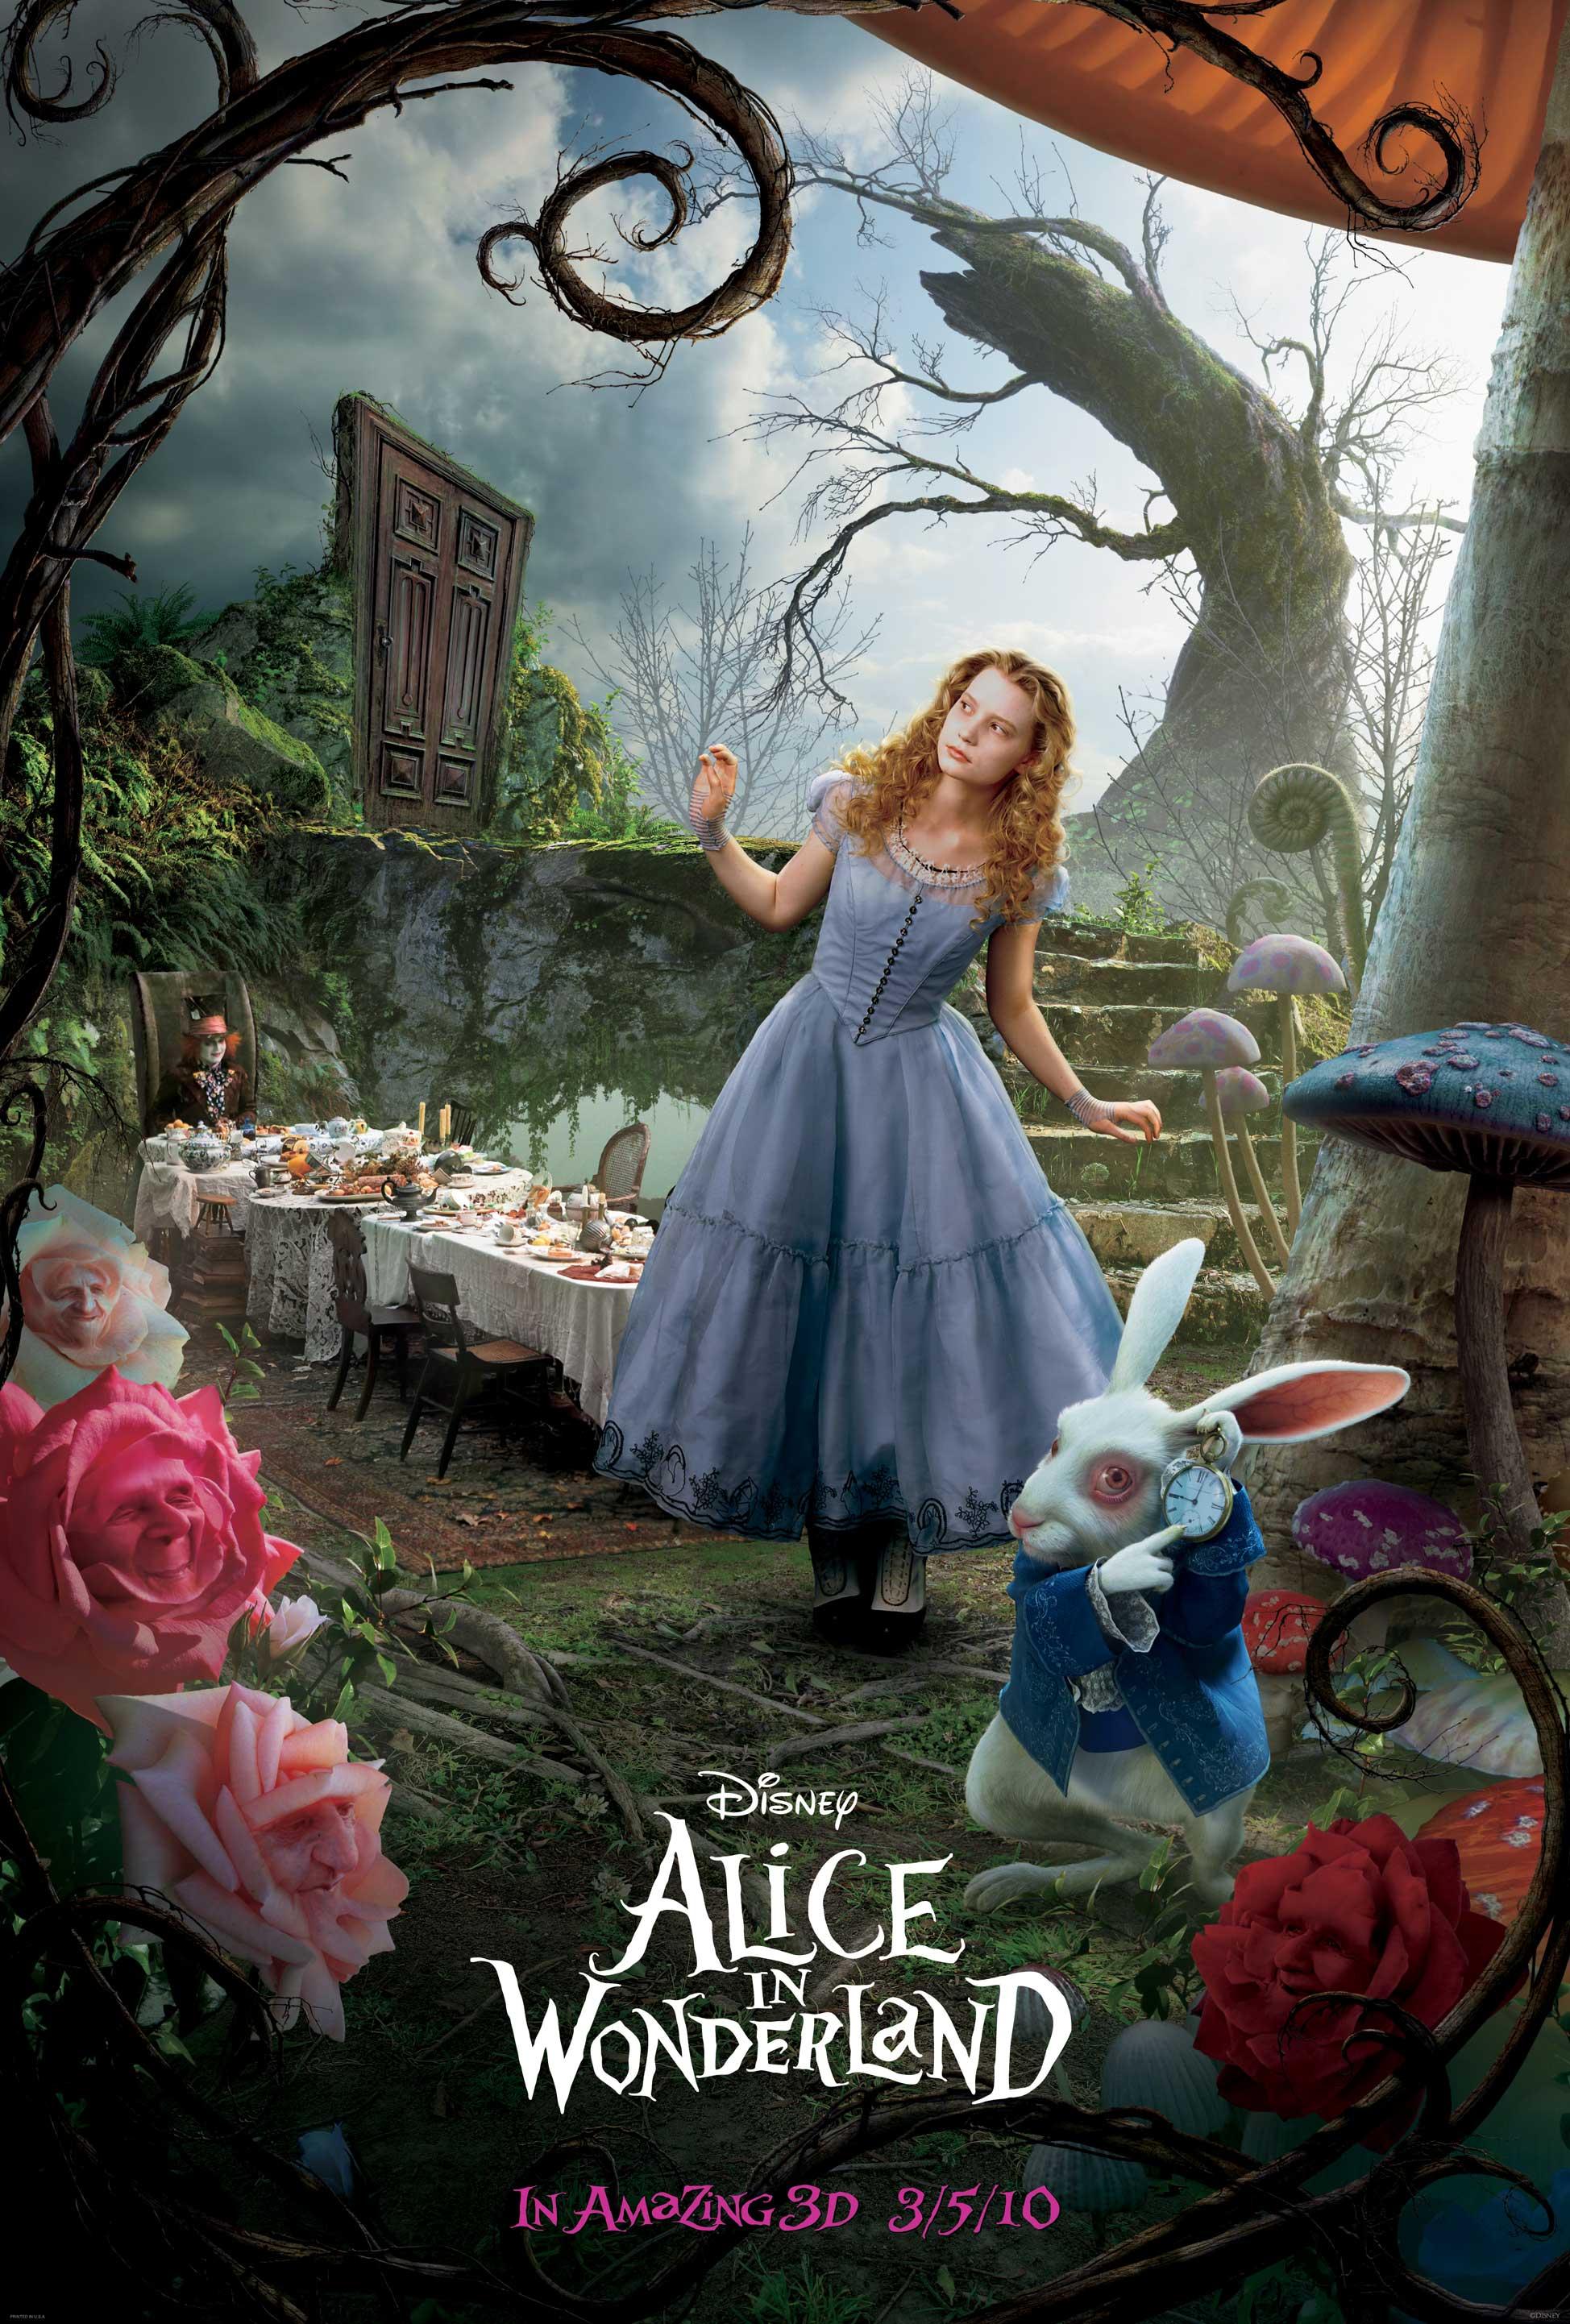 Alice And The White Rabbit Movie Poster Desktop Wallpaper